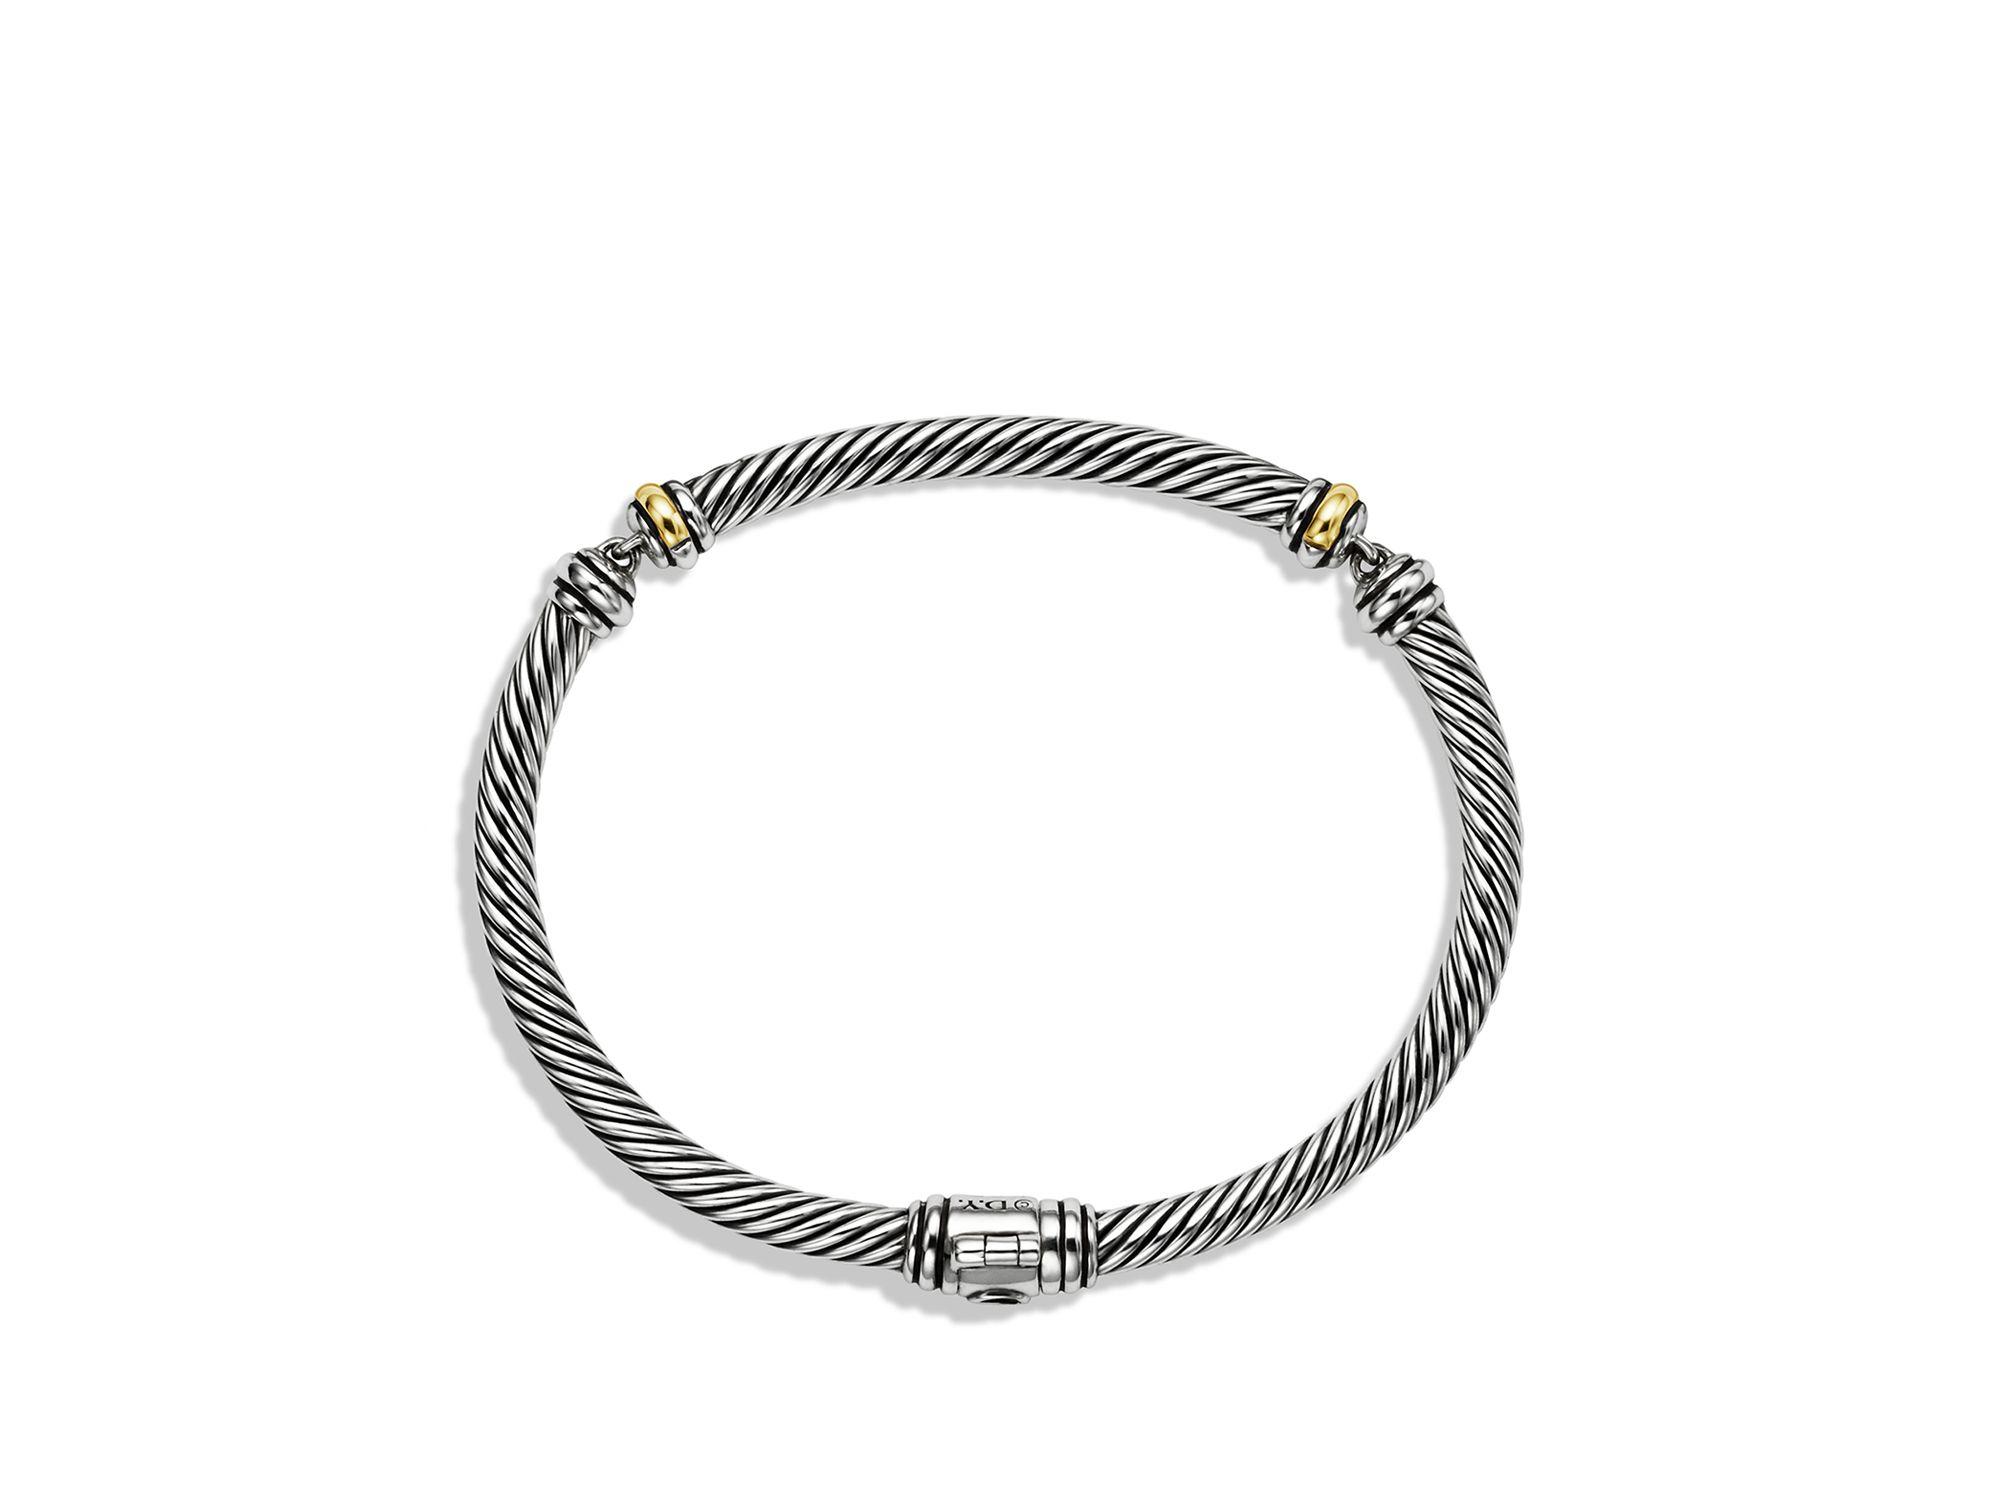 David yurman Metro Cable Bracelet With Gold in Metallic Lyst